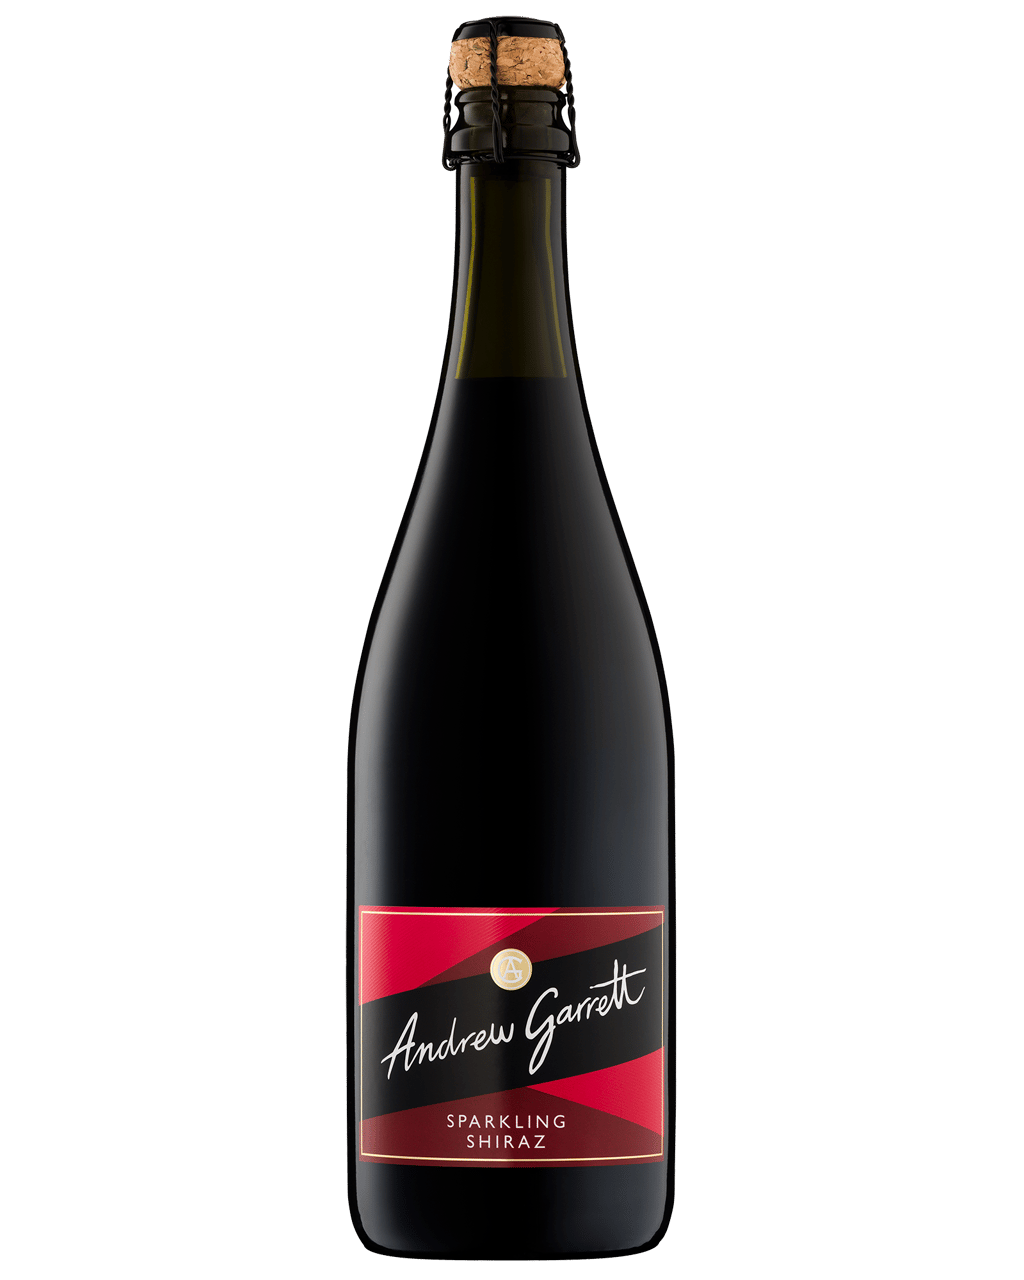 Andrew Garrett Sparkling Shiraz Dan Murphys Buy Wine Champagne Smith Bermuda Shorts Cokelat 33 Beer Spirits Online